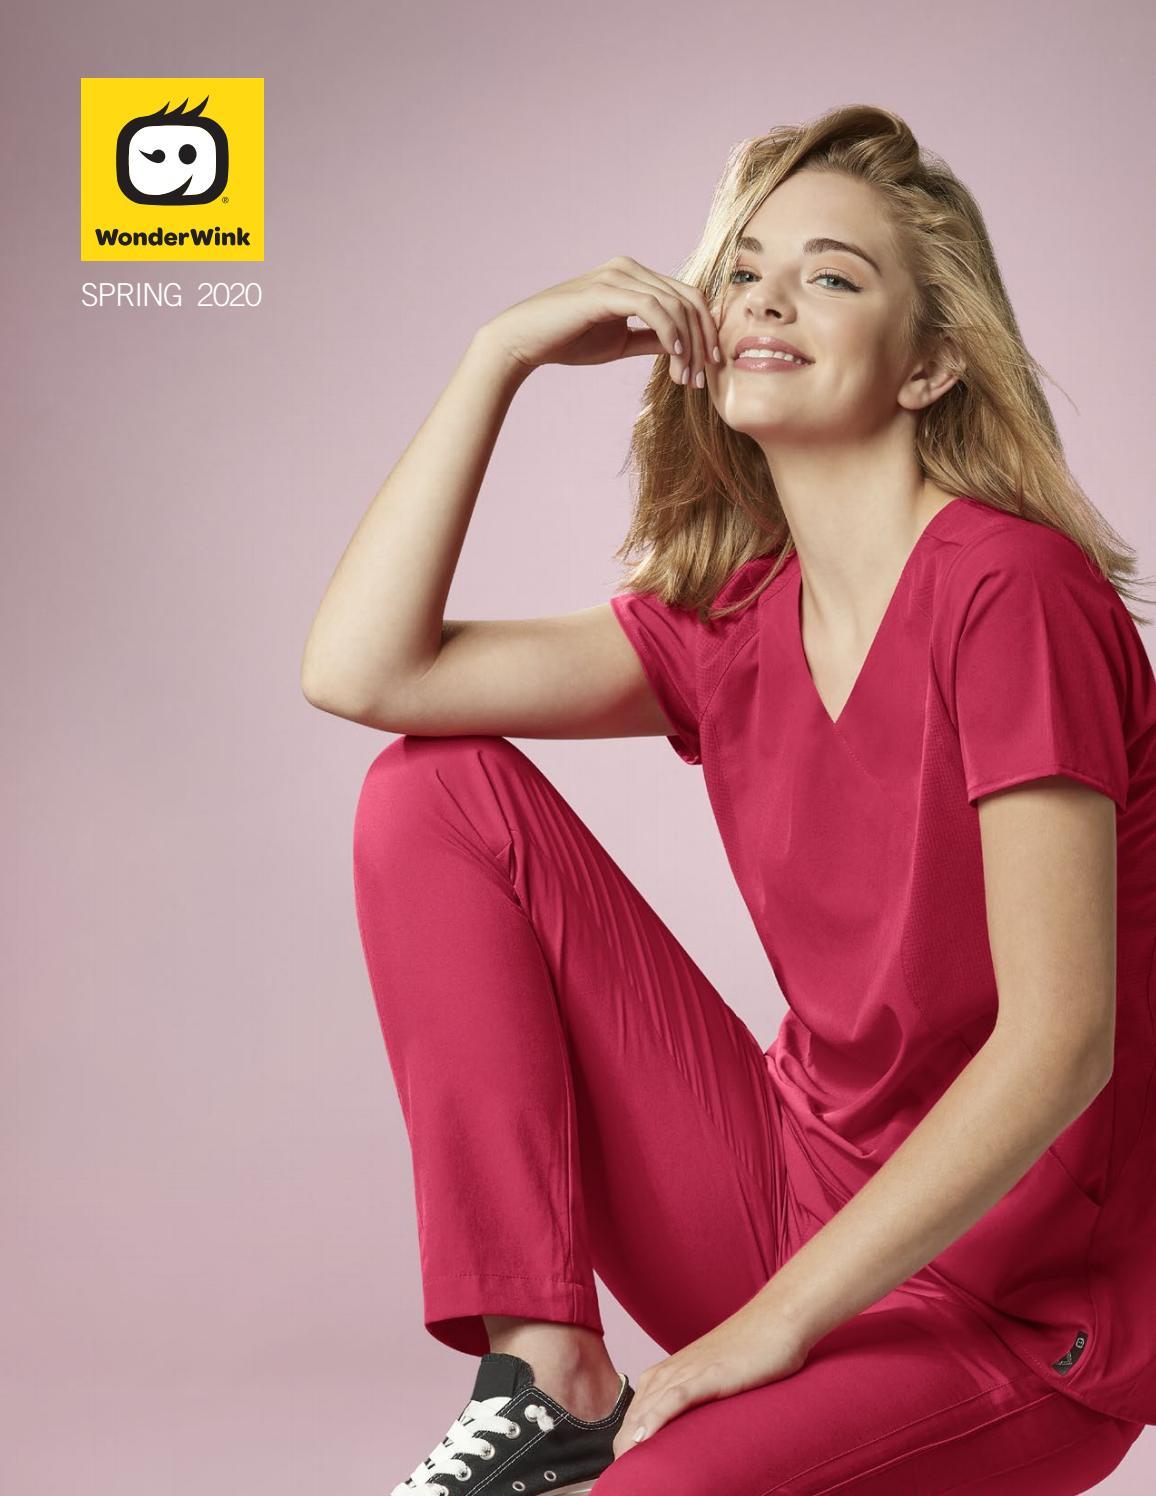 WonderWink Women/'s Origins Kilo Short-Sleeve Front-Zip Top 6086A FREE SHIPPING!